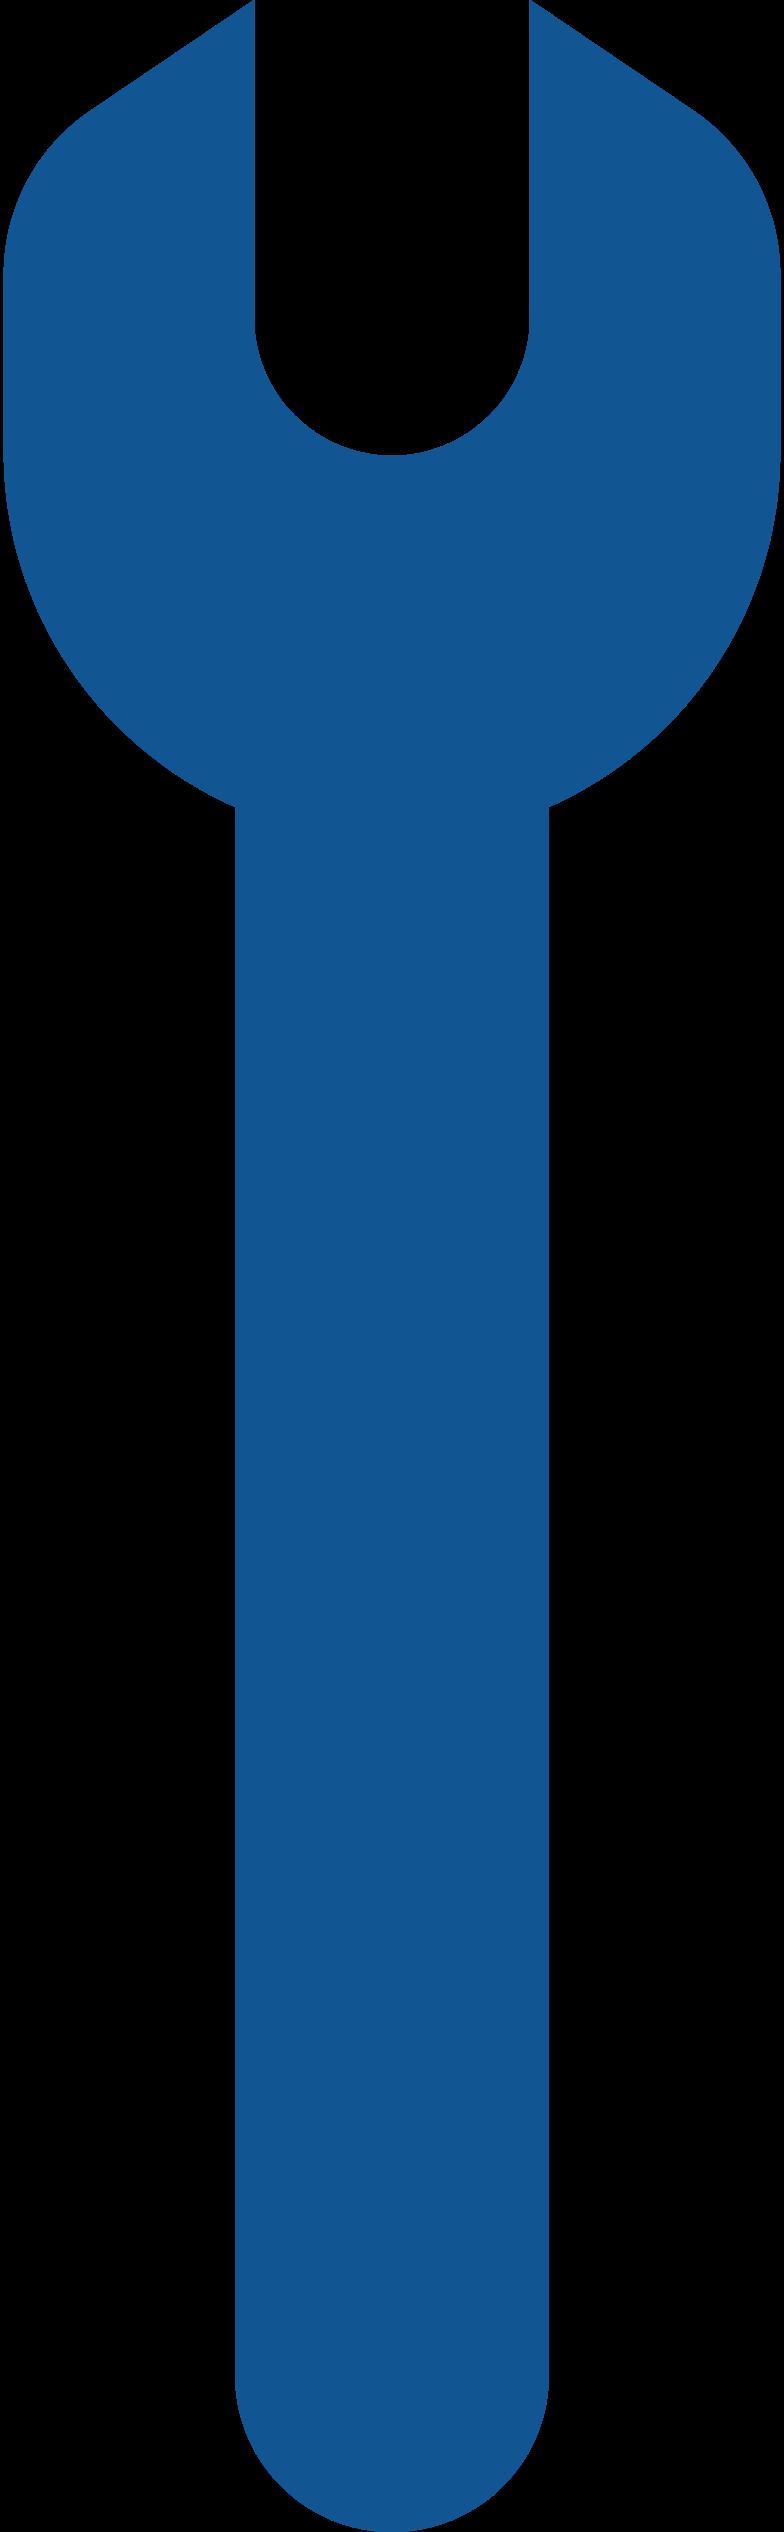 Клипарт wrench в PNG и SVG